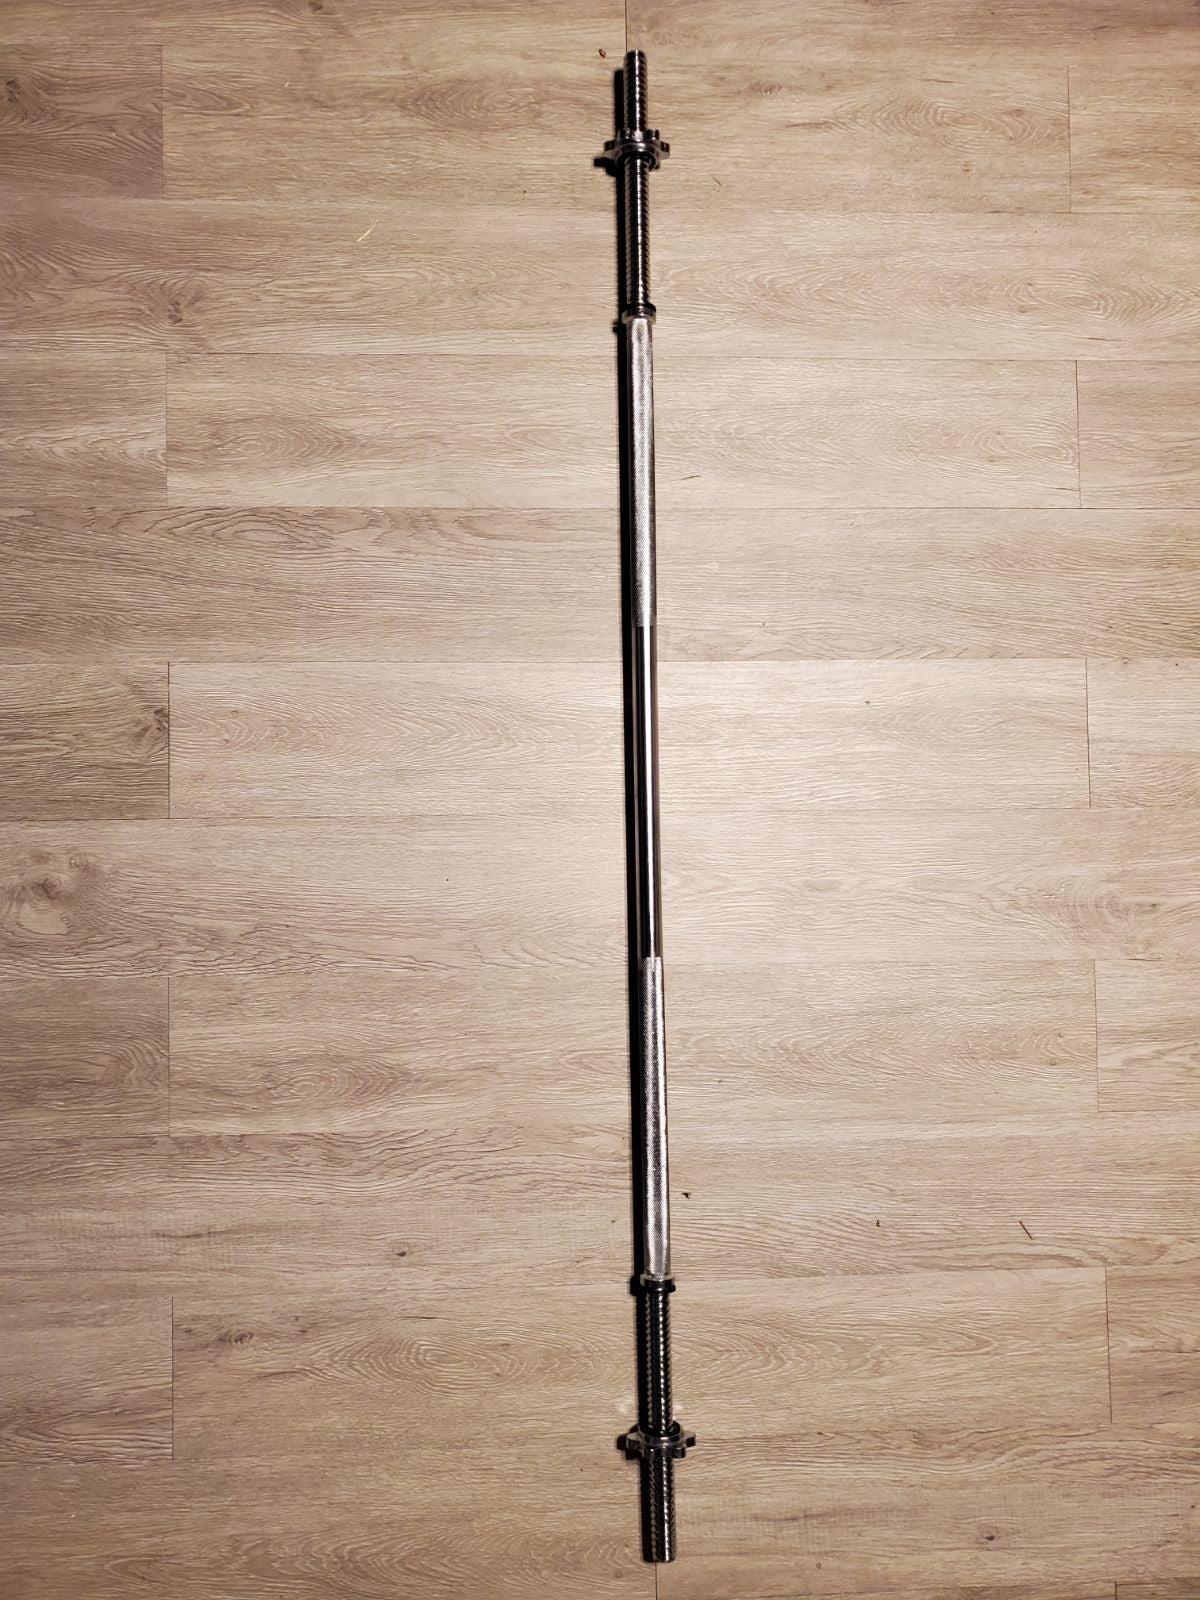 "New 6FT Standard 1"" Barbell for Standard"